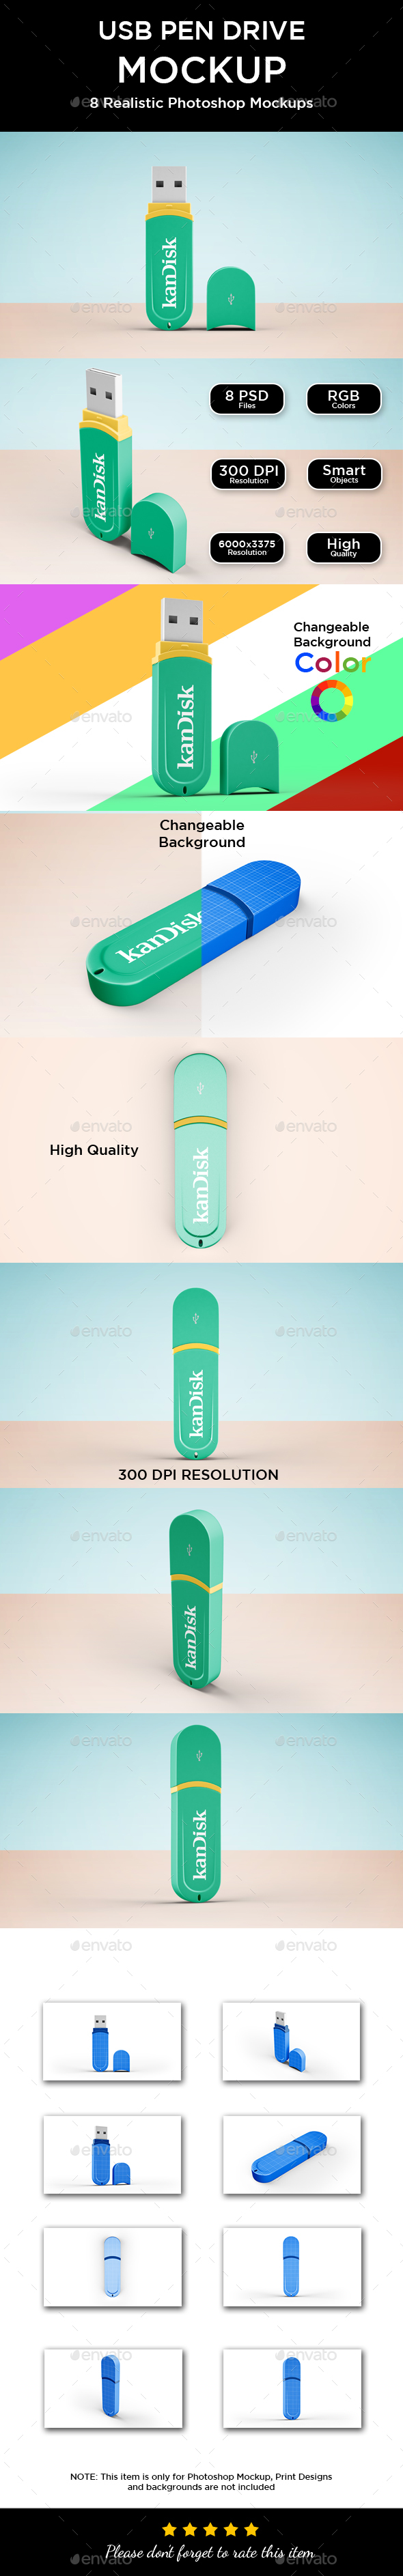 USB Pen Drive Mockup - Product Mock-Ups Graphics